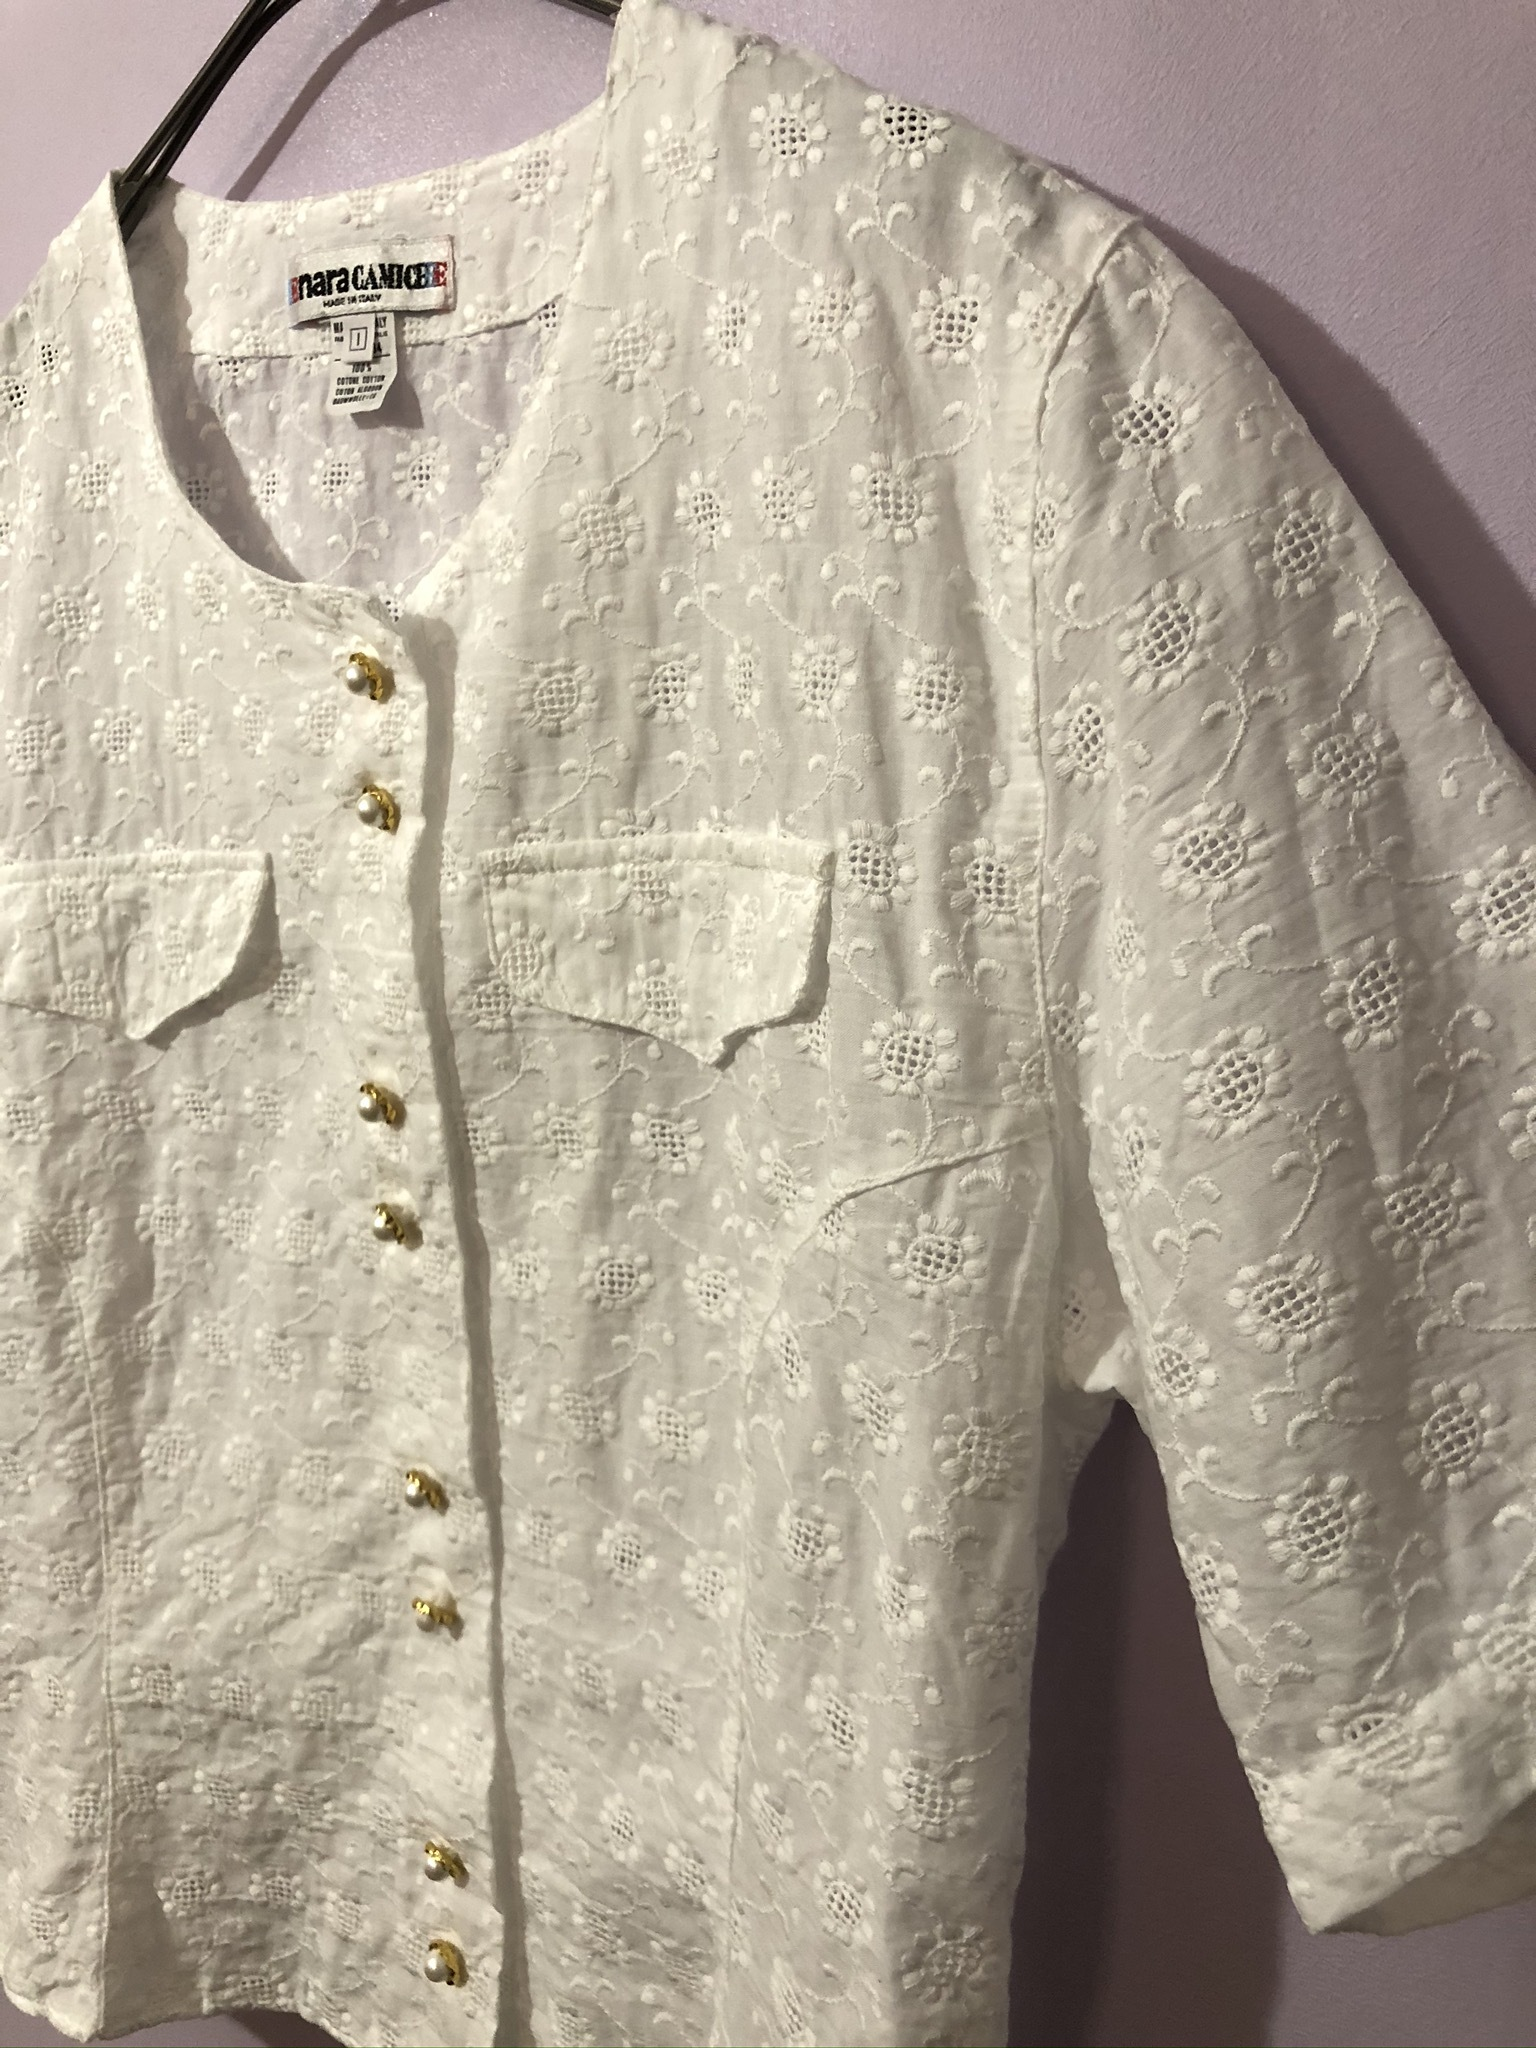 embloidery nocollar shirt